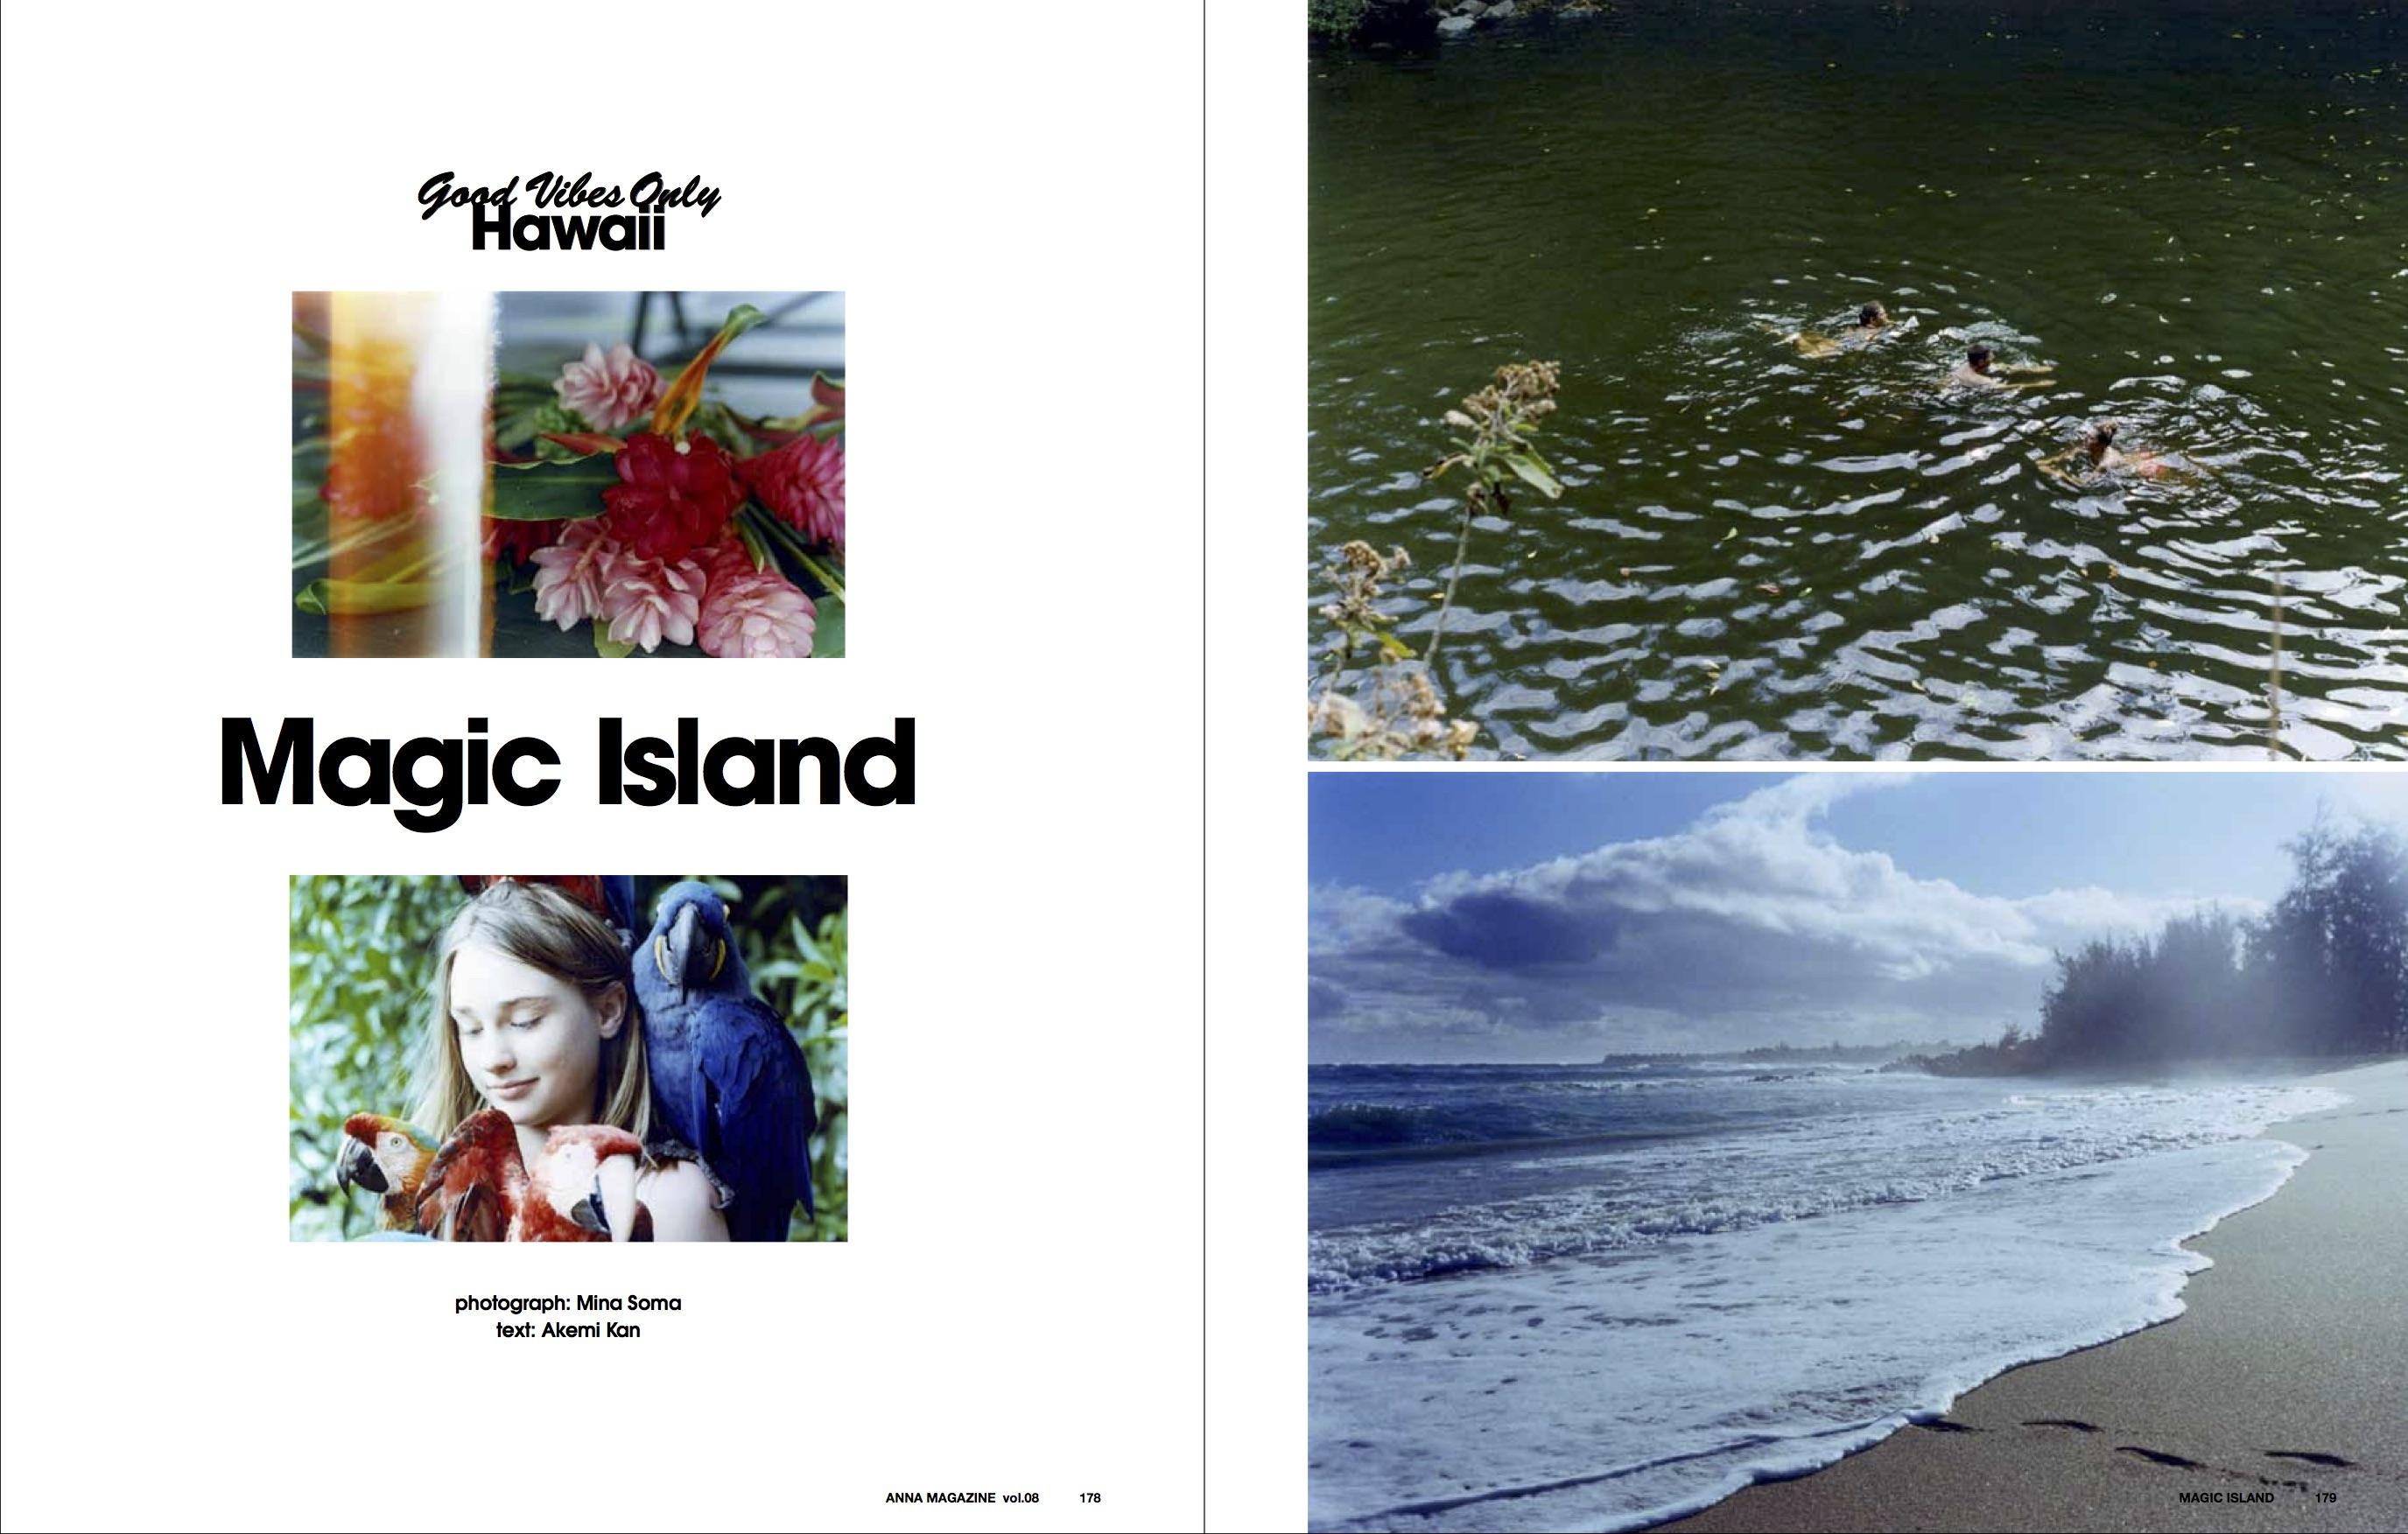 anna magazine vol.8 P90